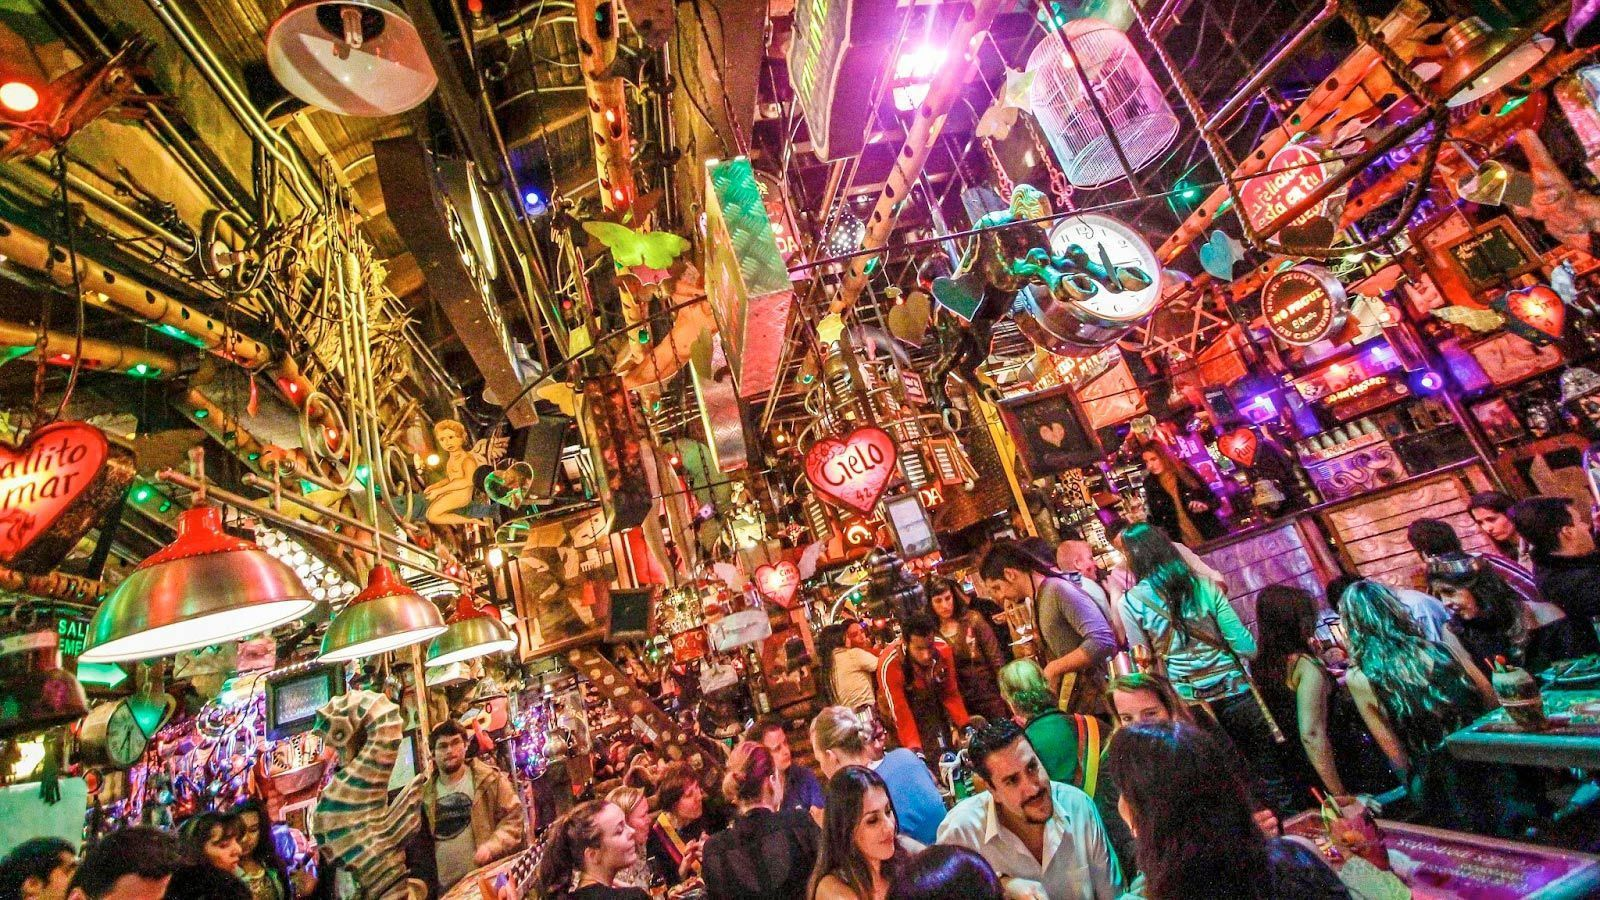 View inside the vibrand Bogota restaurant-nightclub Andres Carne de Res